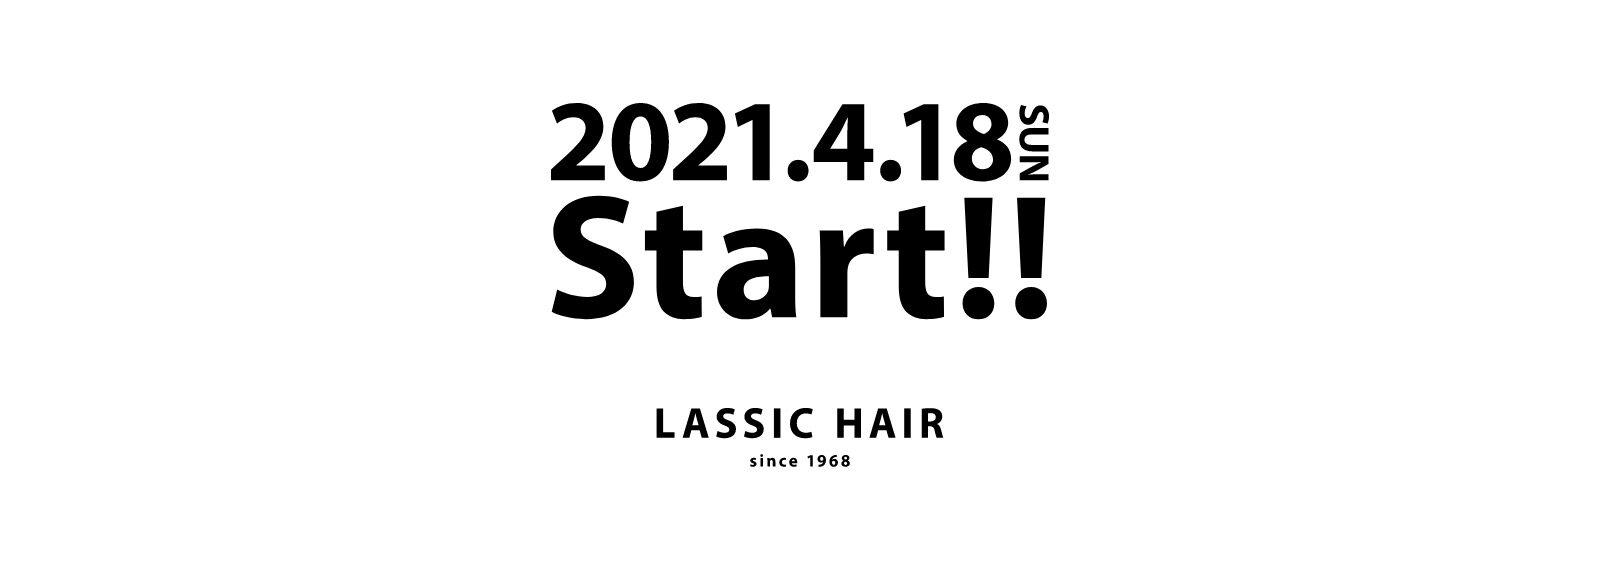 20210418start lassic hair